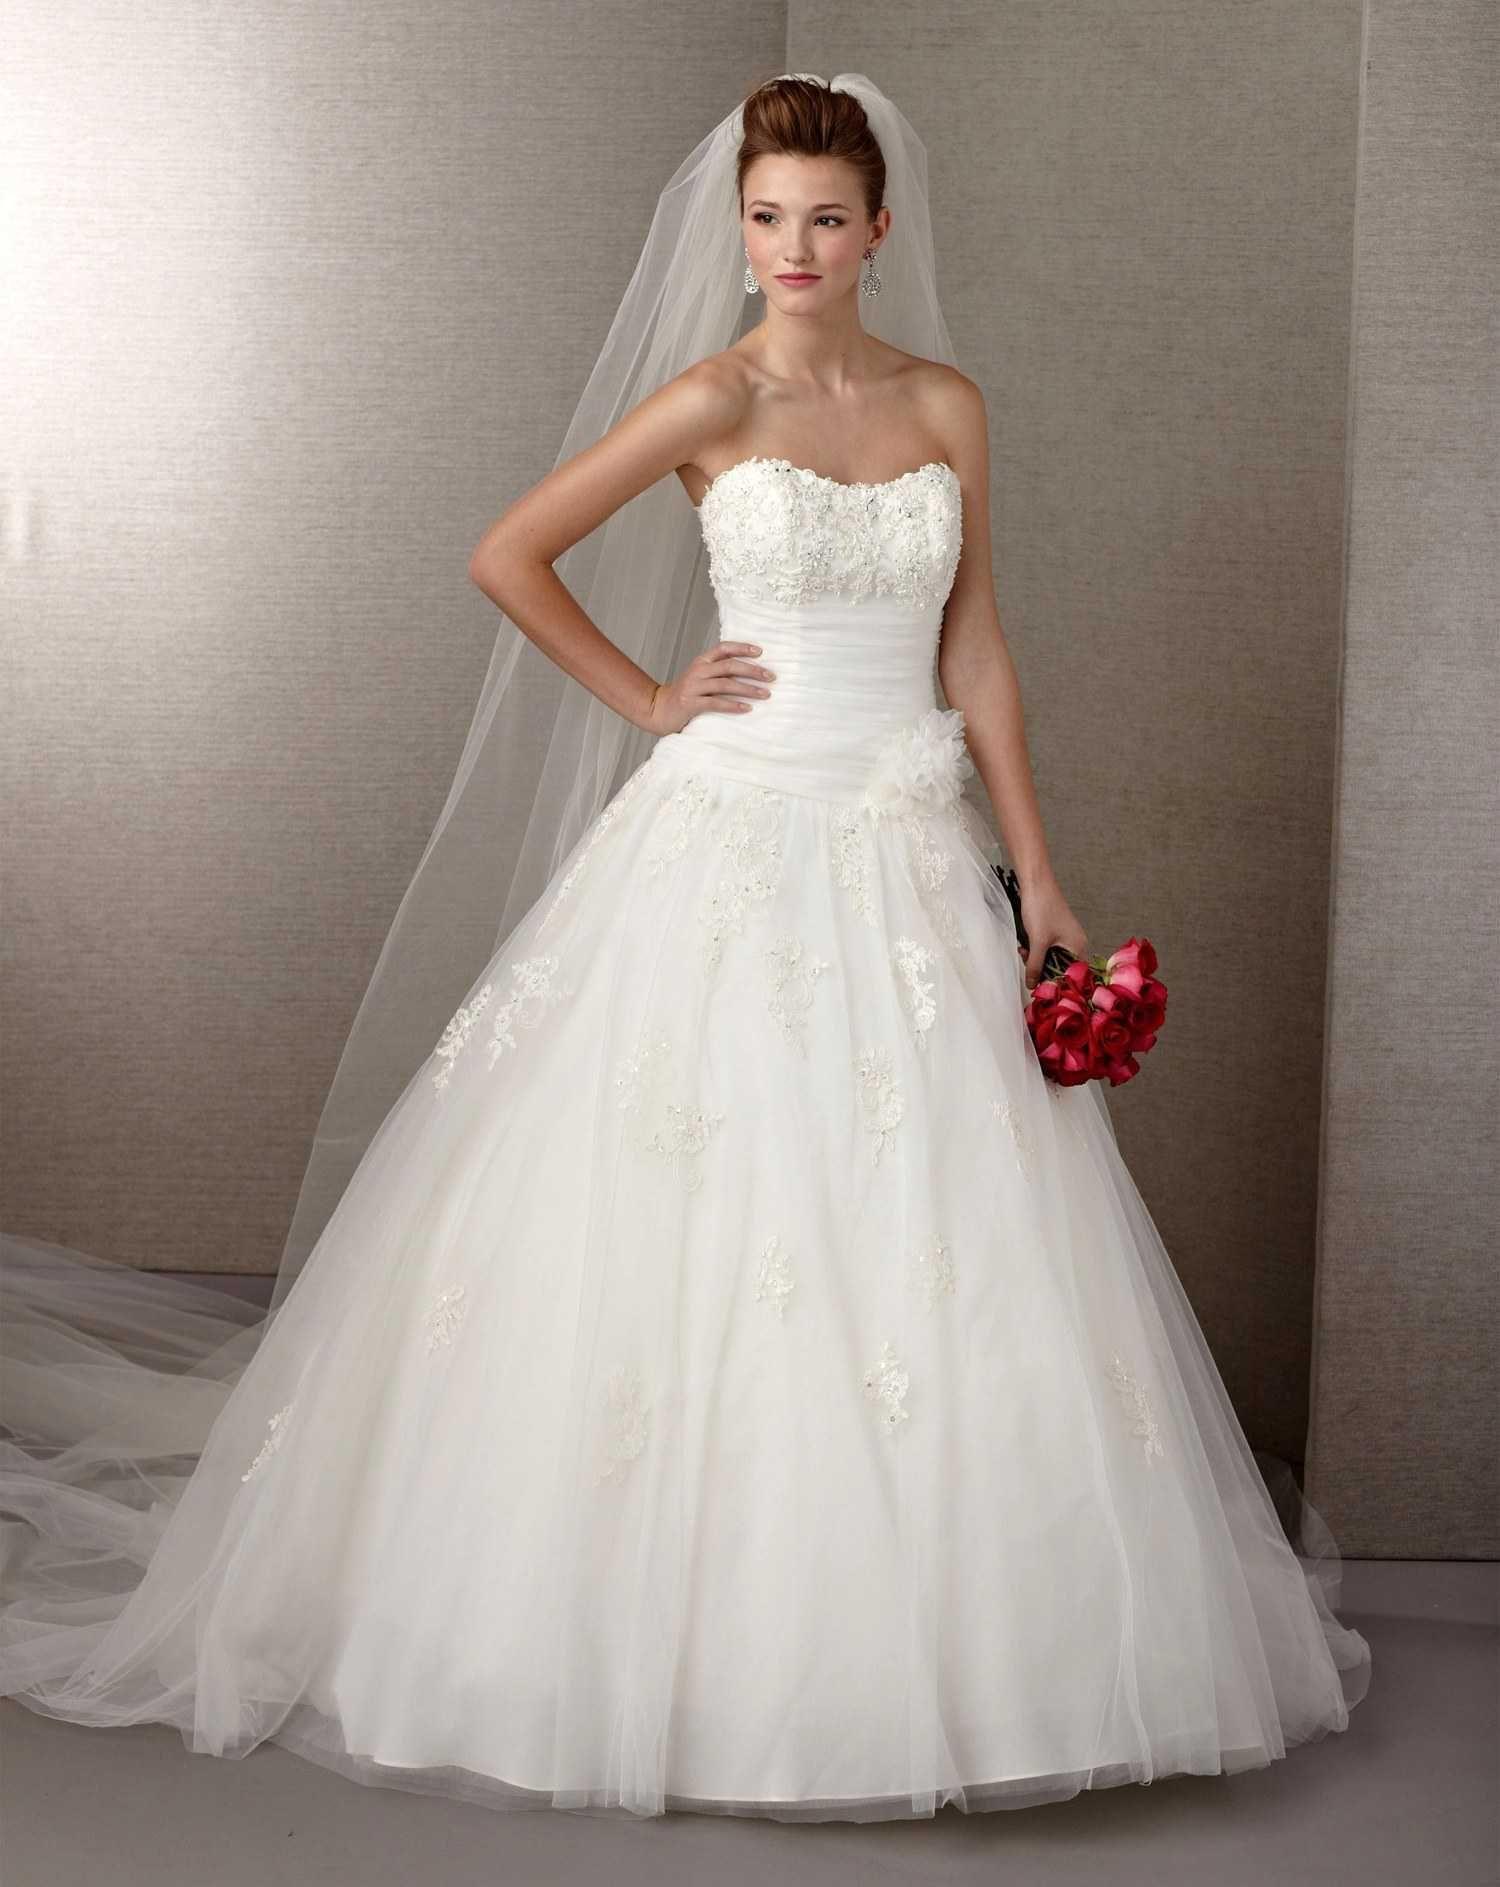 Used wedding dresses near me  Beautiful Wedding Dresses Consignment atlanta Ga  Pinterest